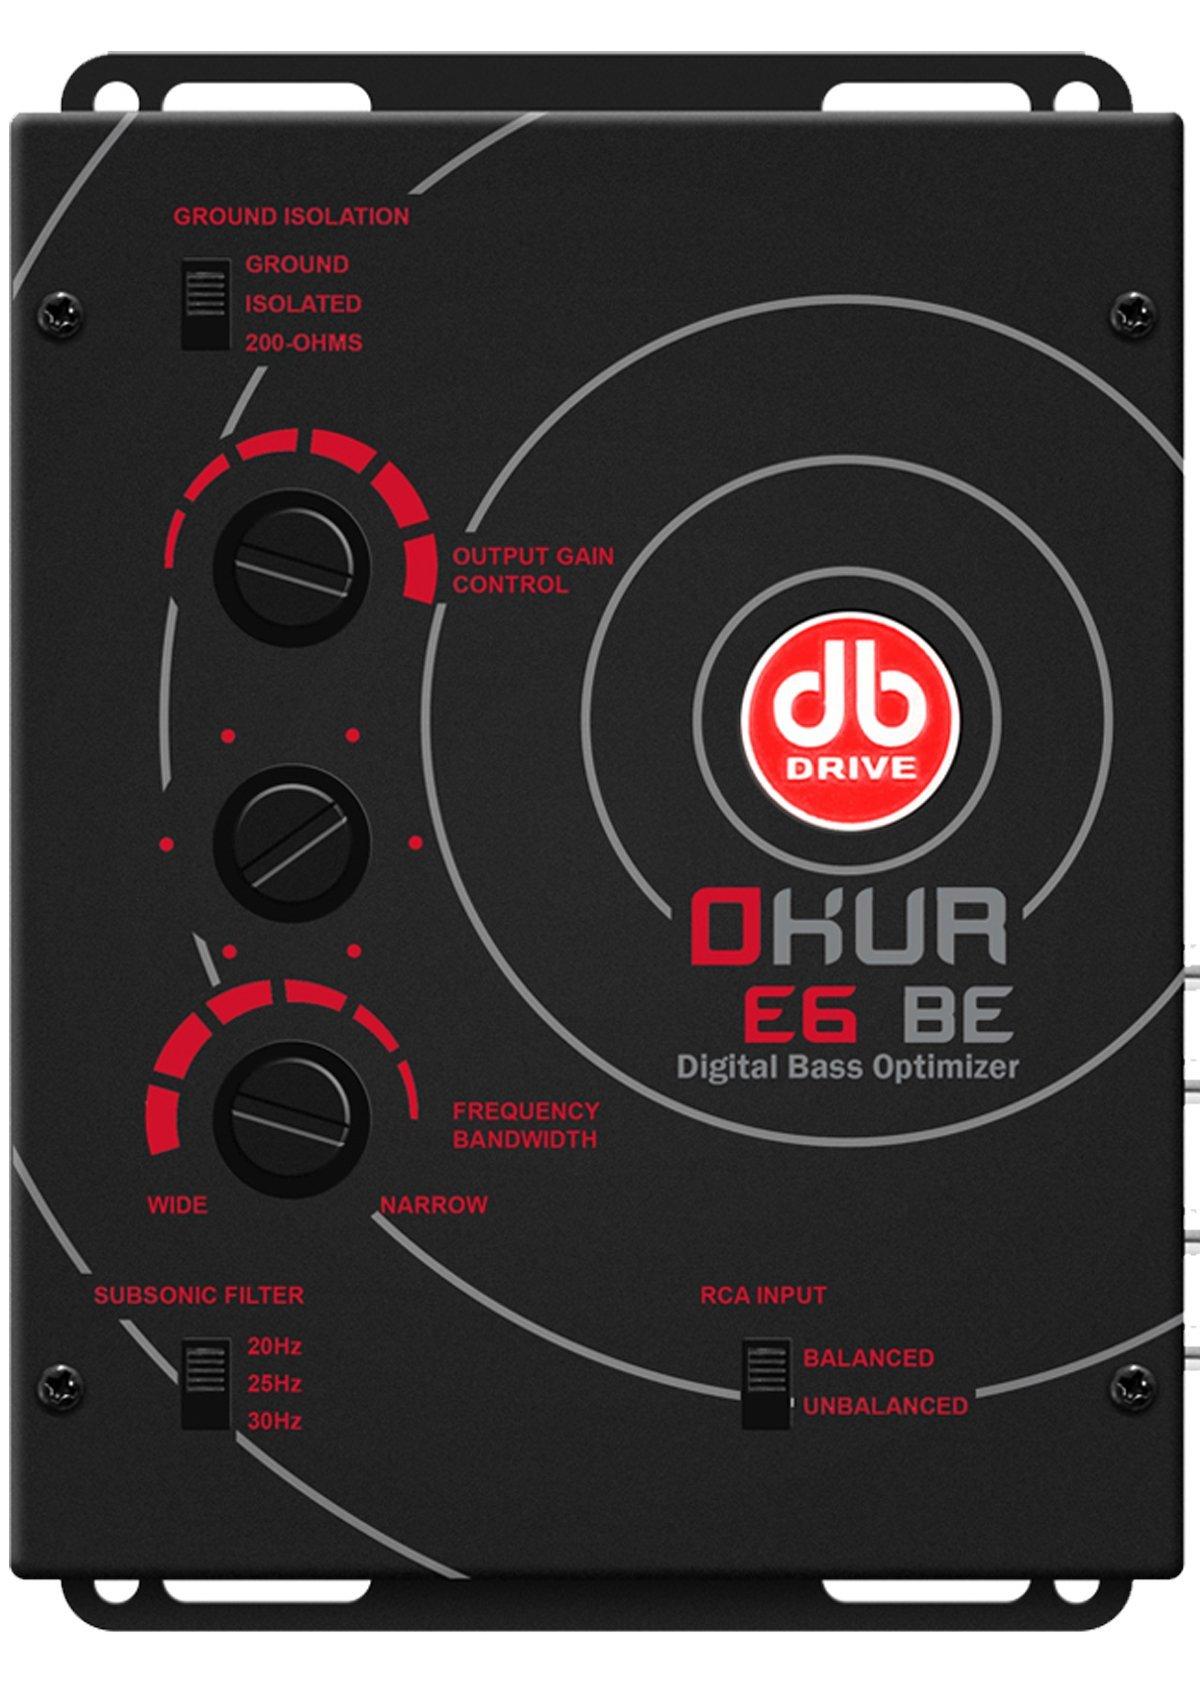 db Drive E6 BE Digital Bass Optimizer